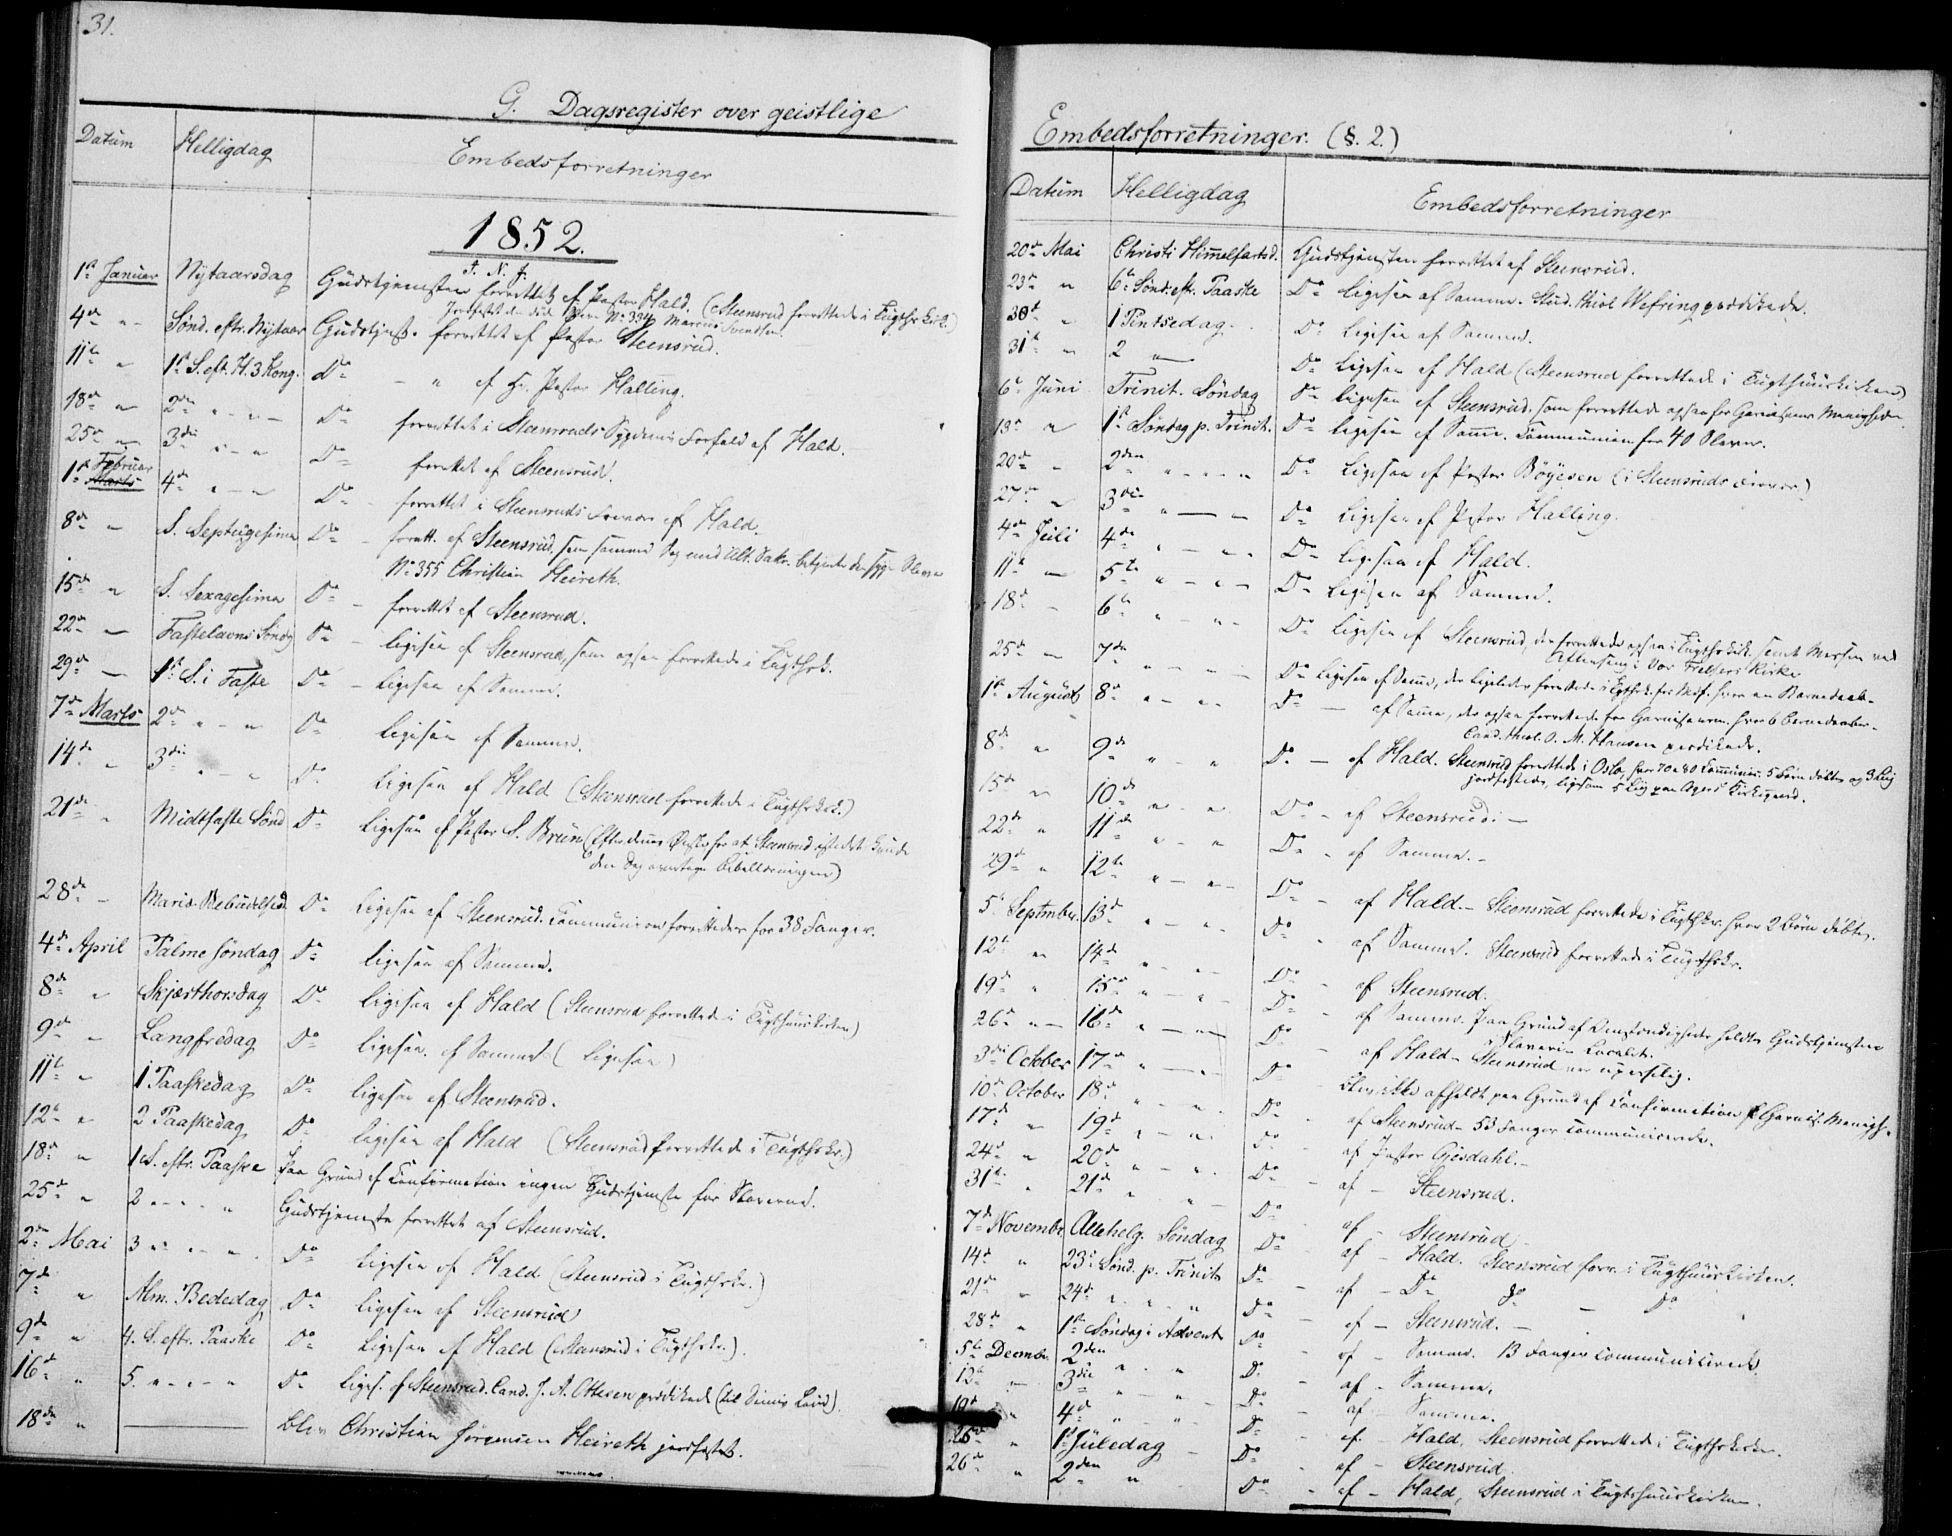 SAO, Akershus festnings slaveri Kirkebøker, F/Fa/L0002: Ministerialbok nr. 2, 1852-1883, s. 31